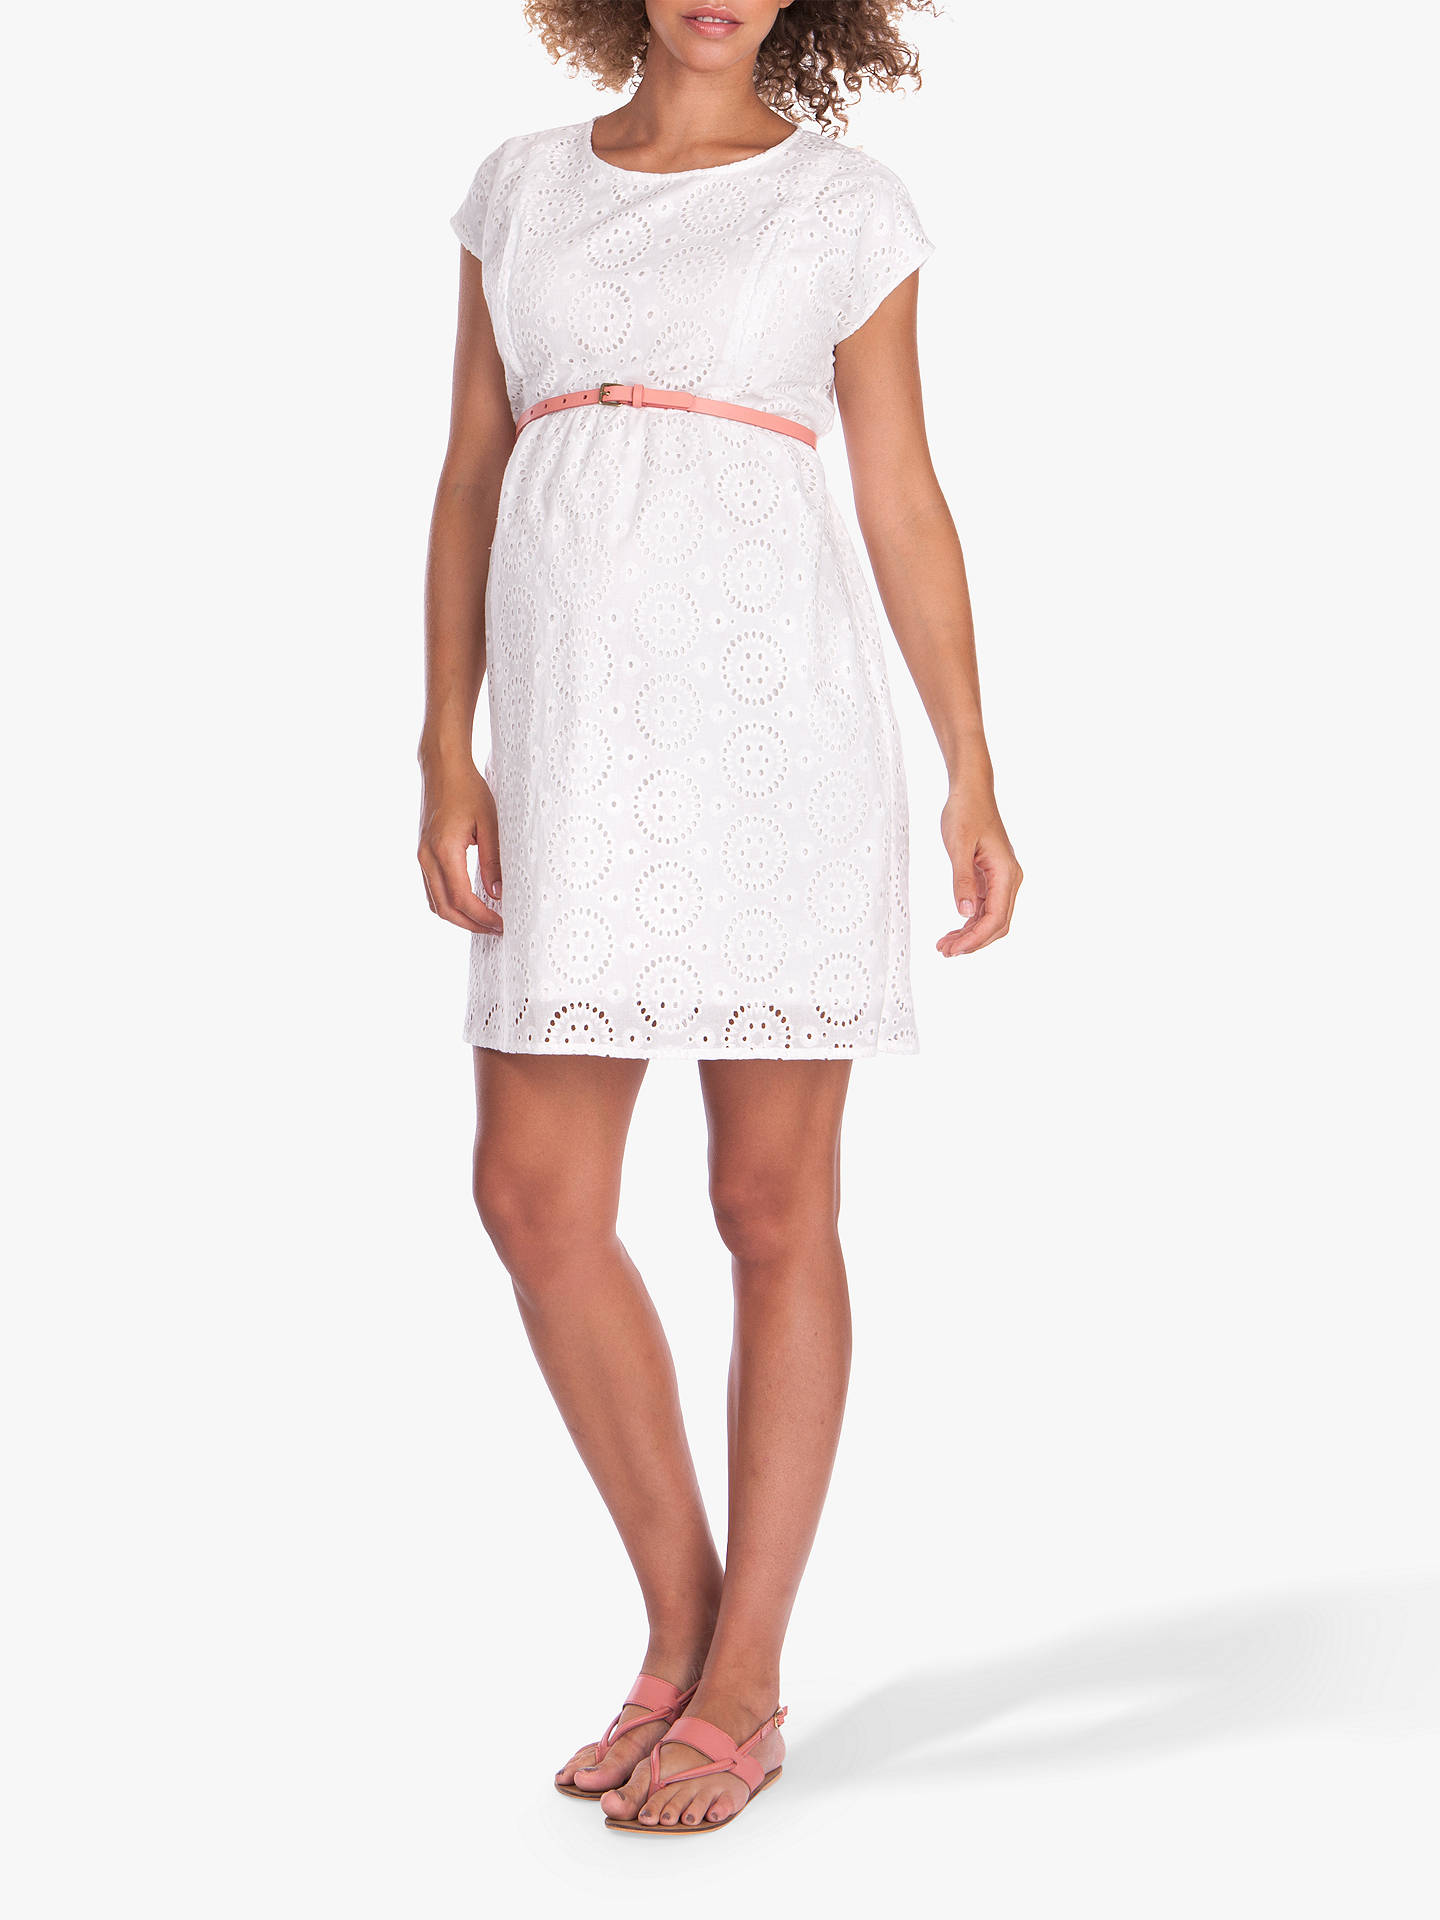 344050a1b6 Summer Maternity Dresses Online   Saddha